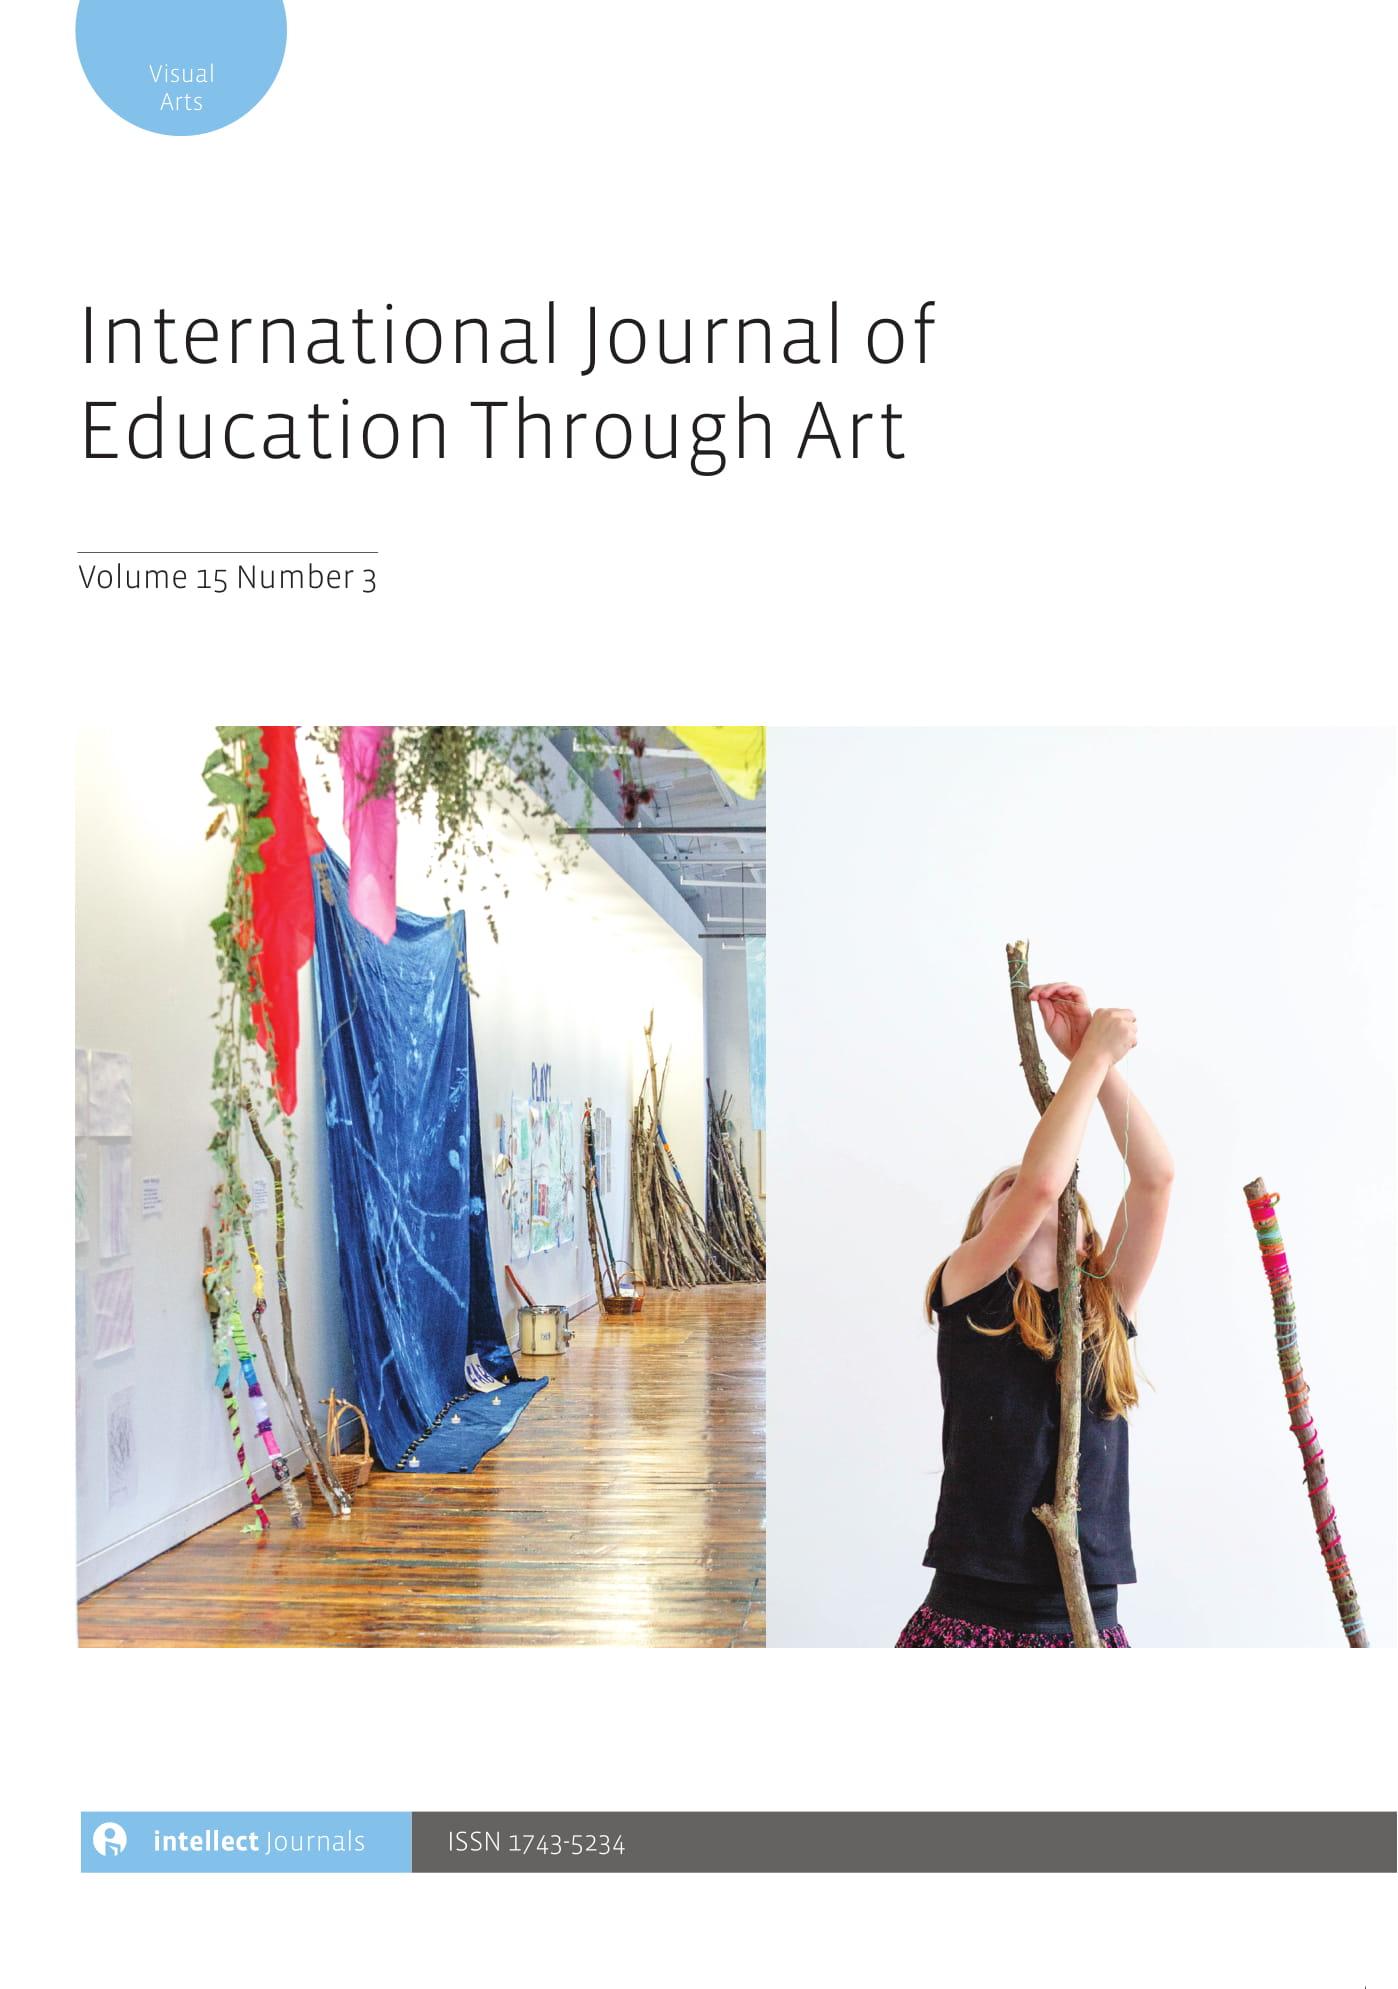 View Vol. 15 No. 3 (2019): International Journal of Education Through Art